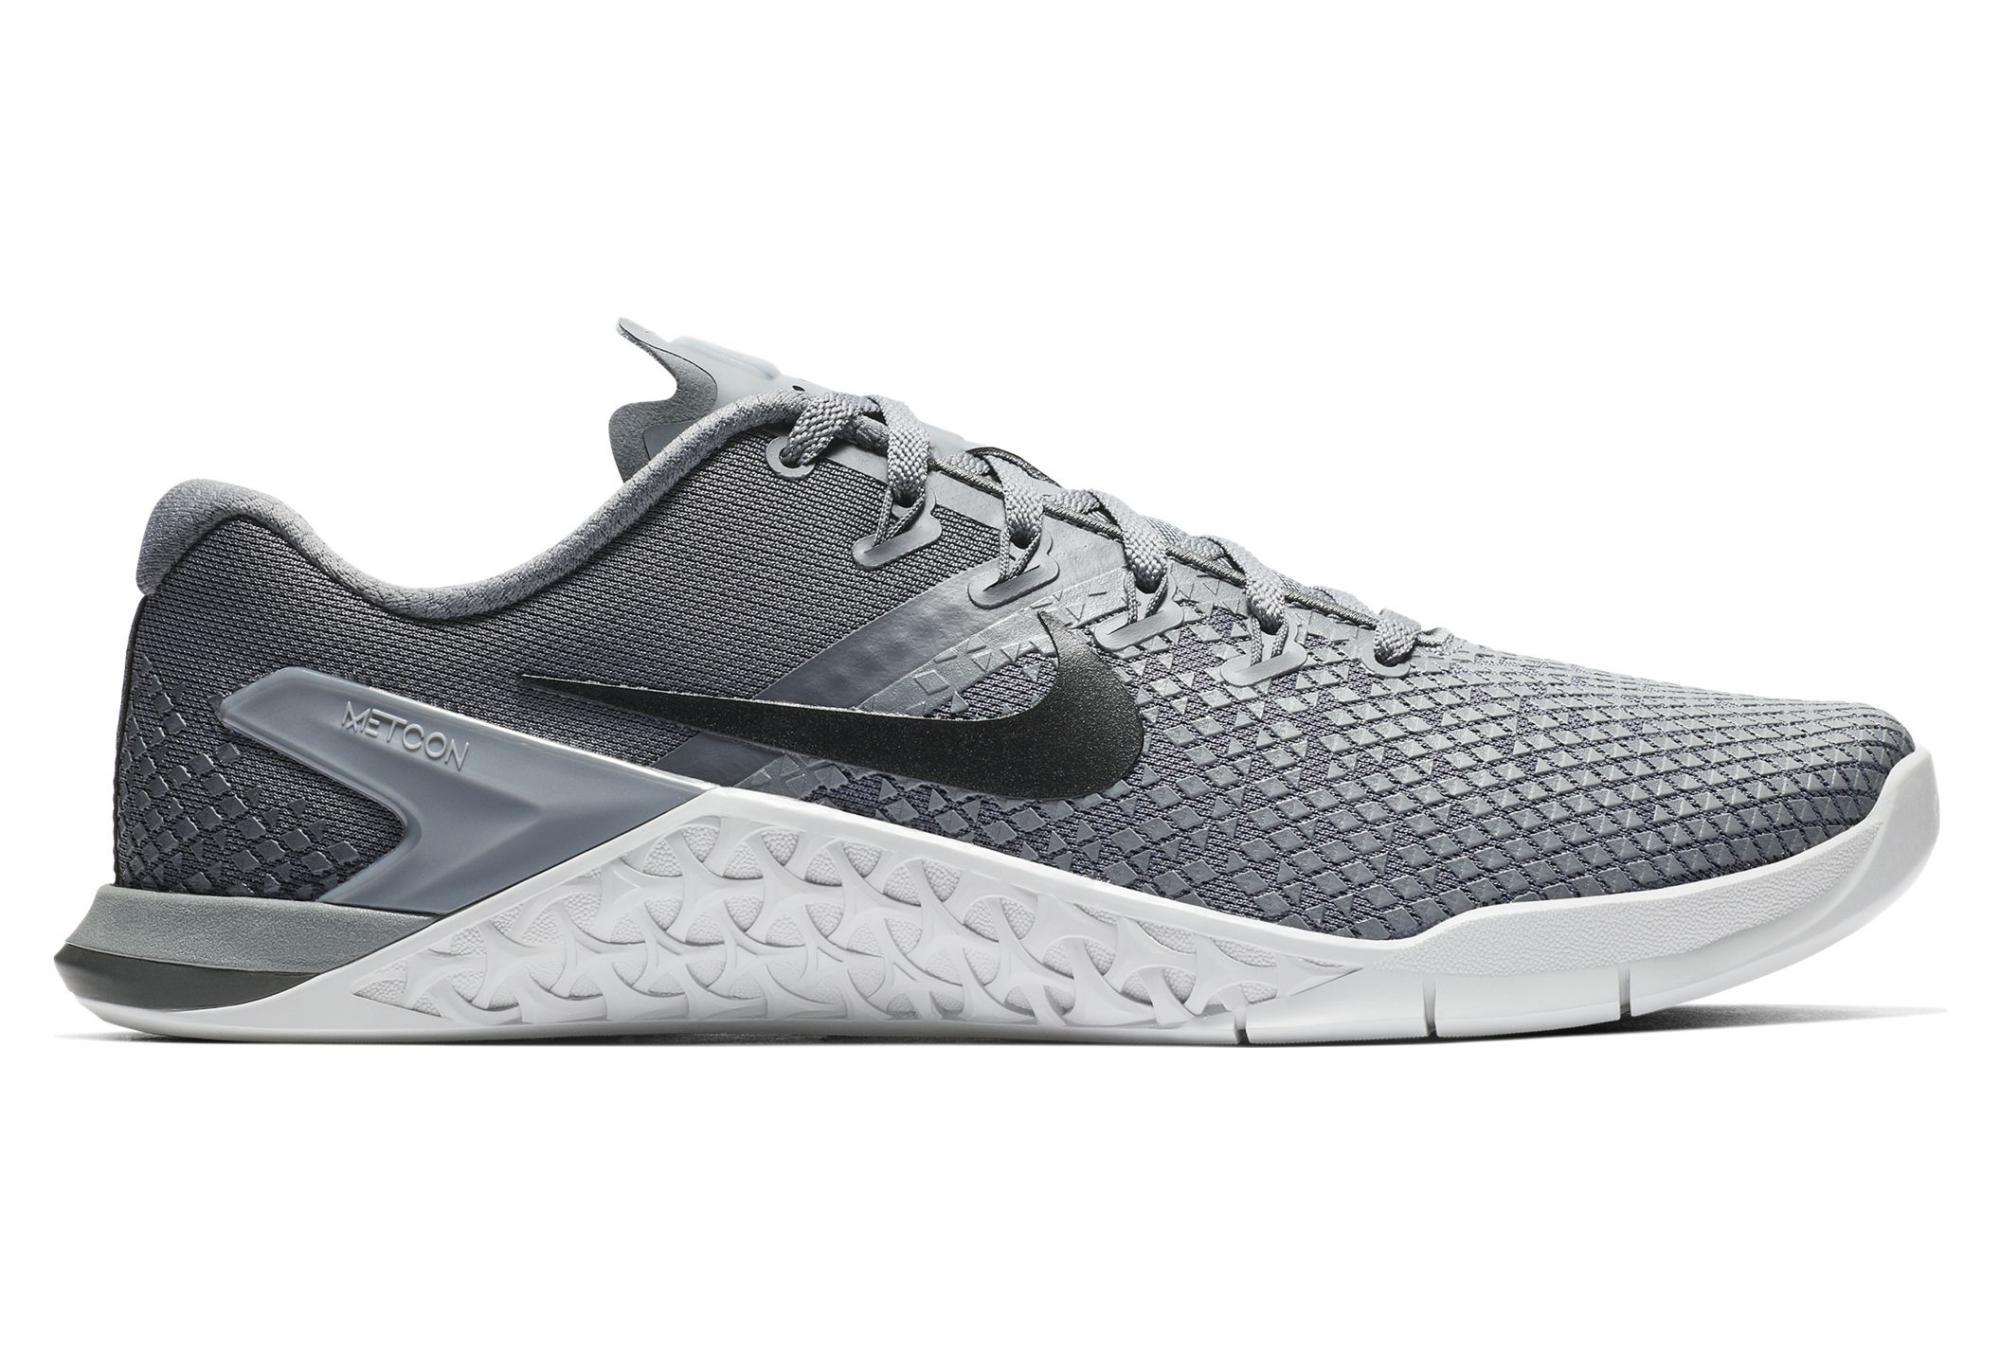 2b0b59908d2 Zapatillas Nike Metcon 4 XD para Hombre Gris